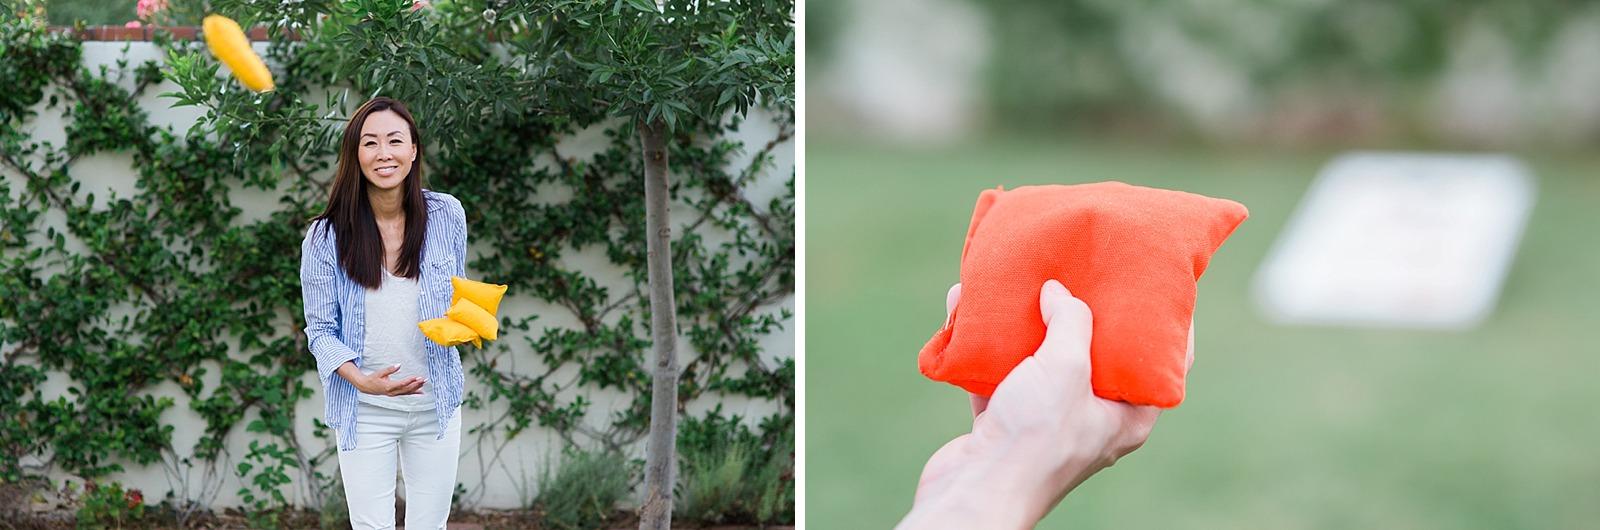 diana-elizabeth-steffen-phoenix-blogger-backyard-games-tosso-com-corn-hole-cornhole-citrus-theme_0096